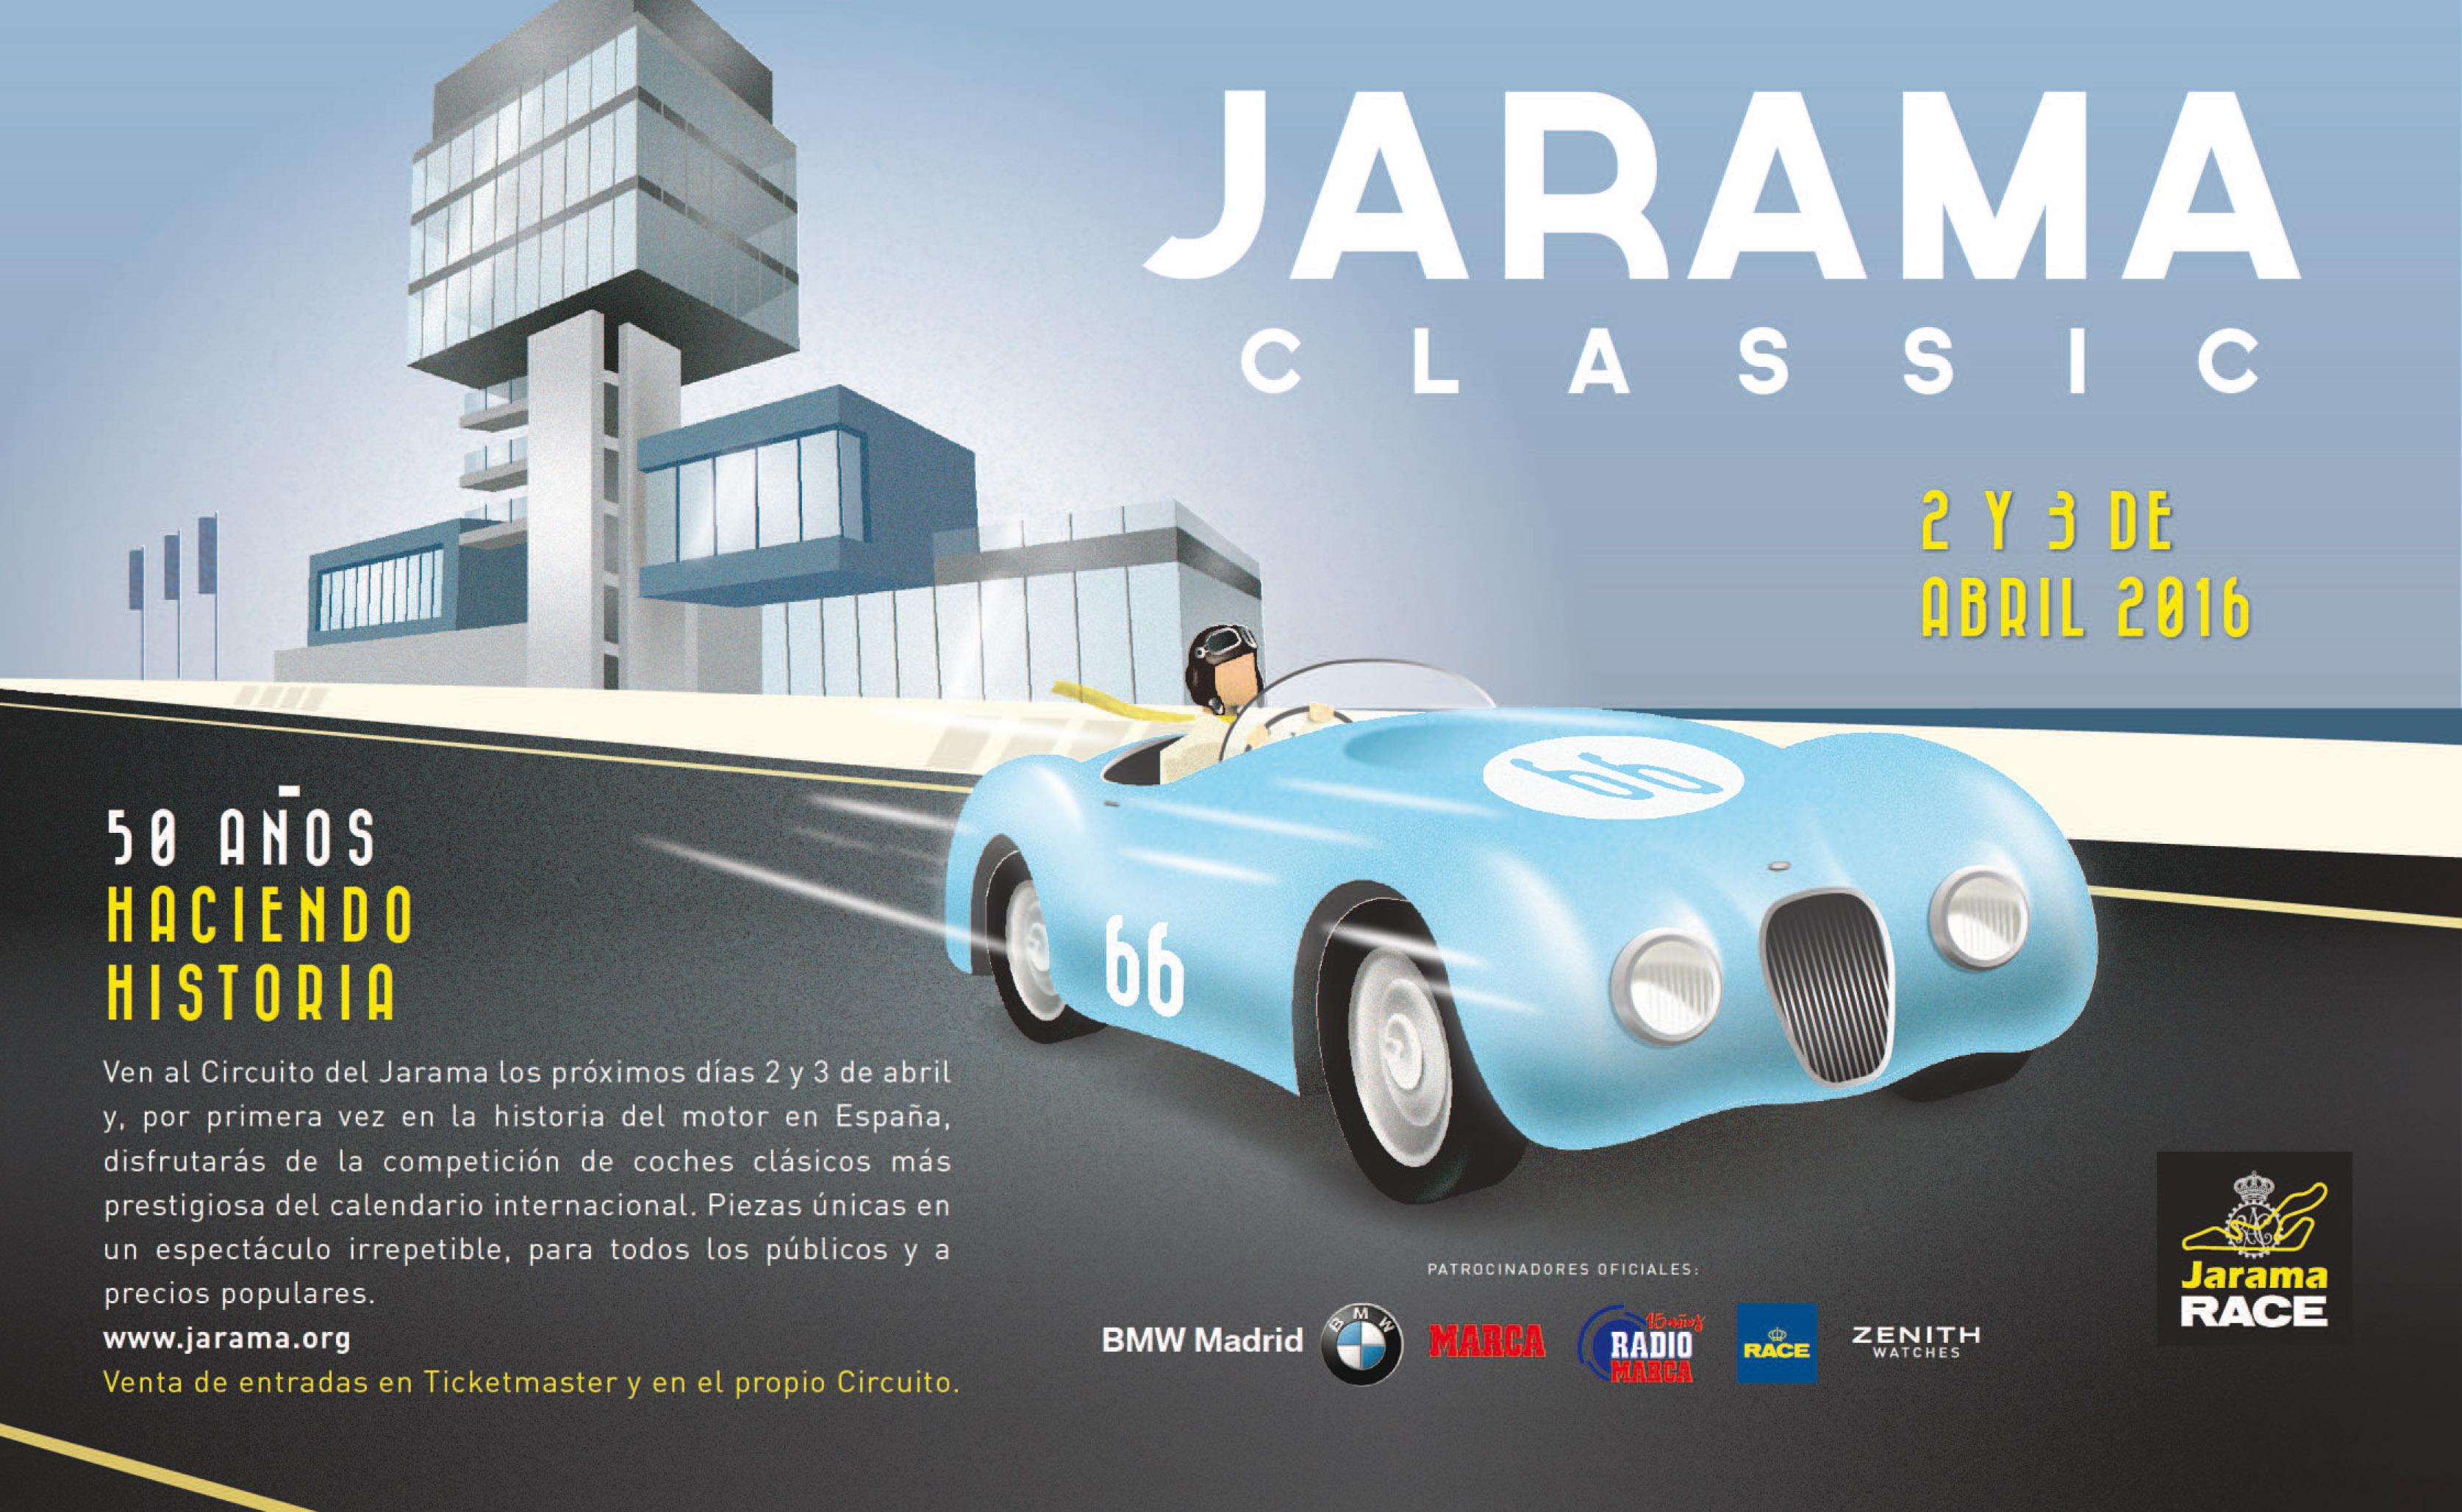 JARAMA CLASSIC ANUNCIO APAISADO.pdf